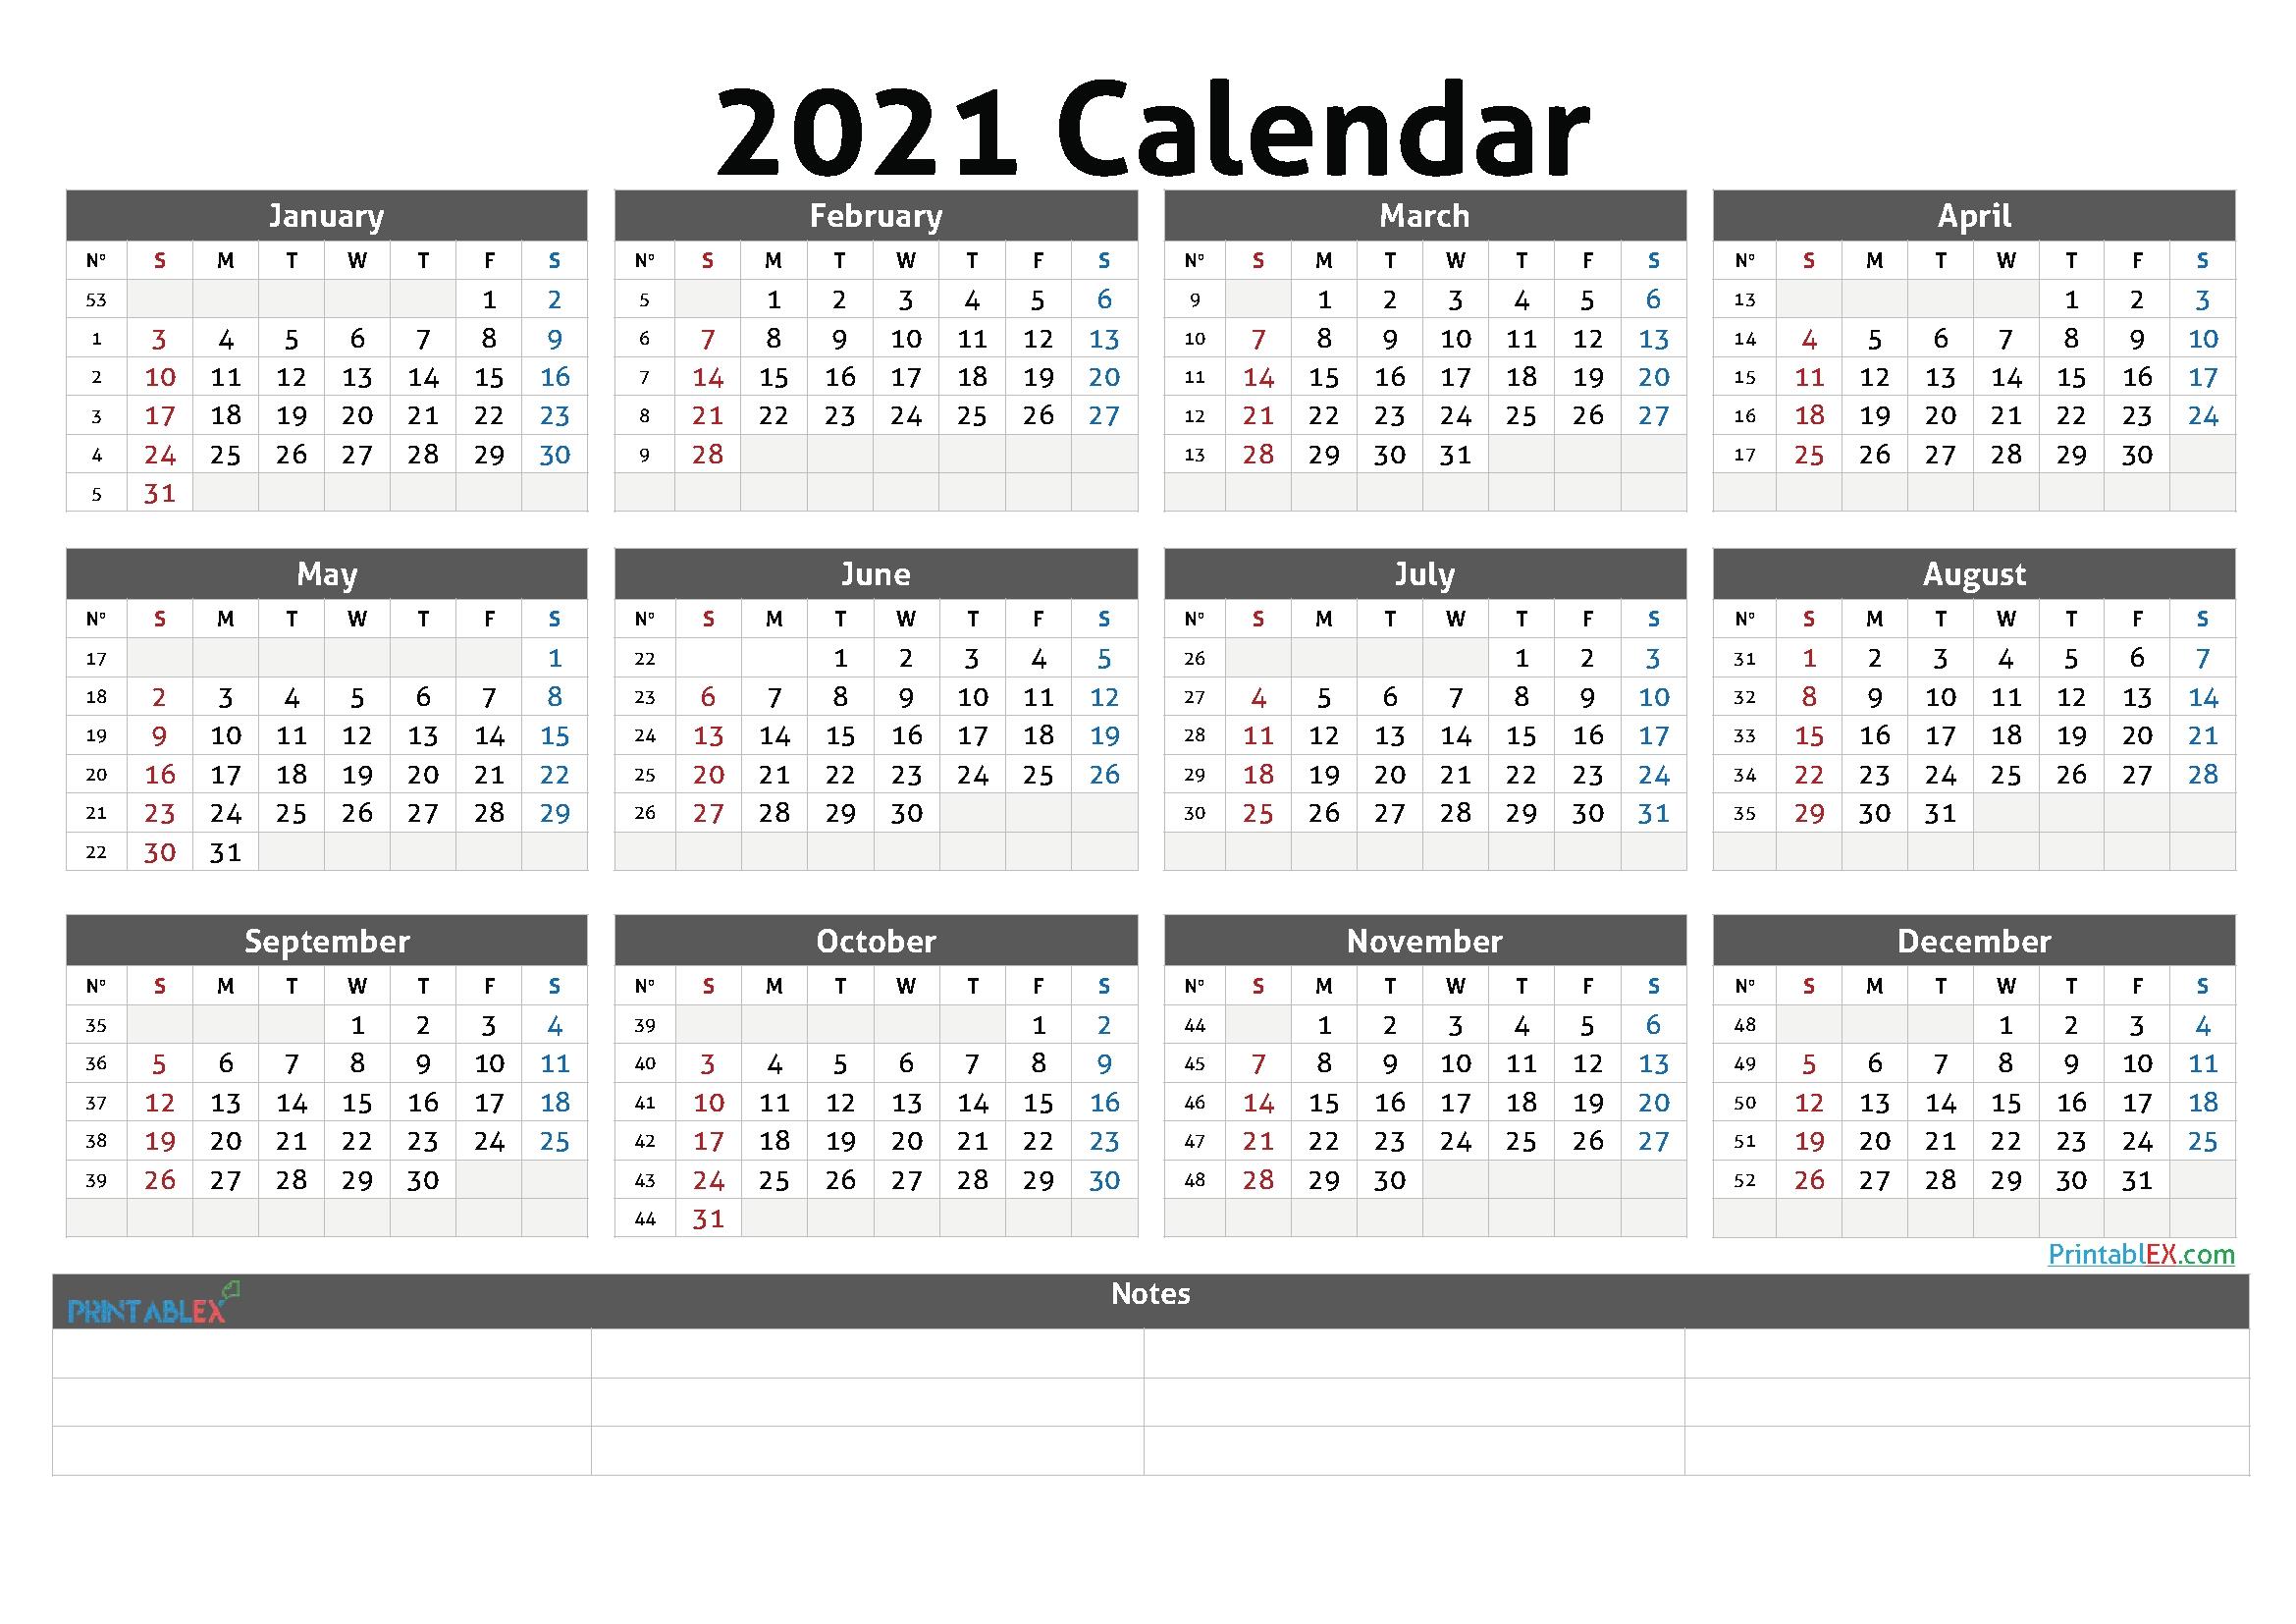 Free Printable 2021 Calendaryear - 21Ytw44 - Free 2020 And 2021 Calendar Printable Monthly